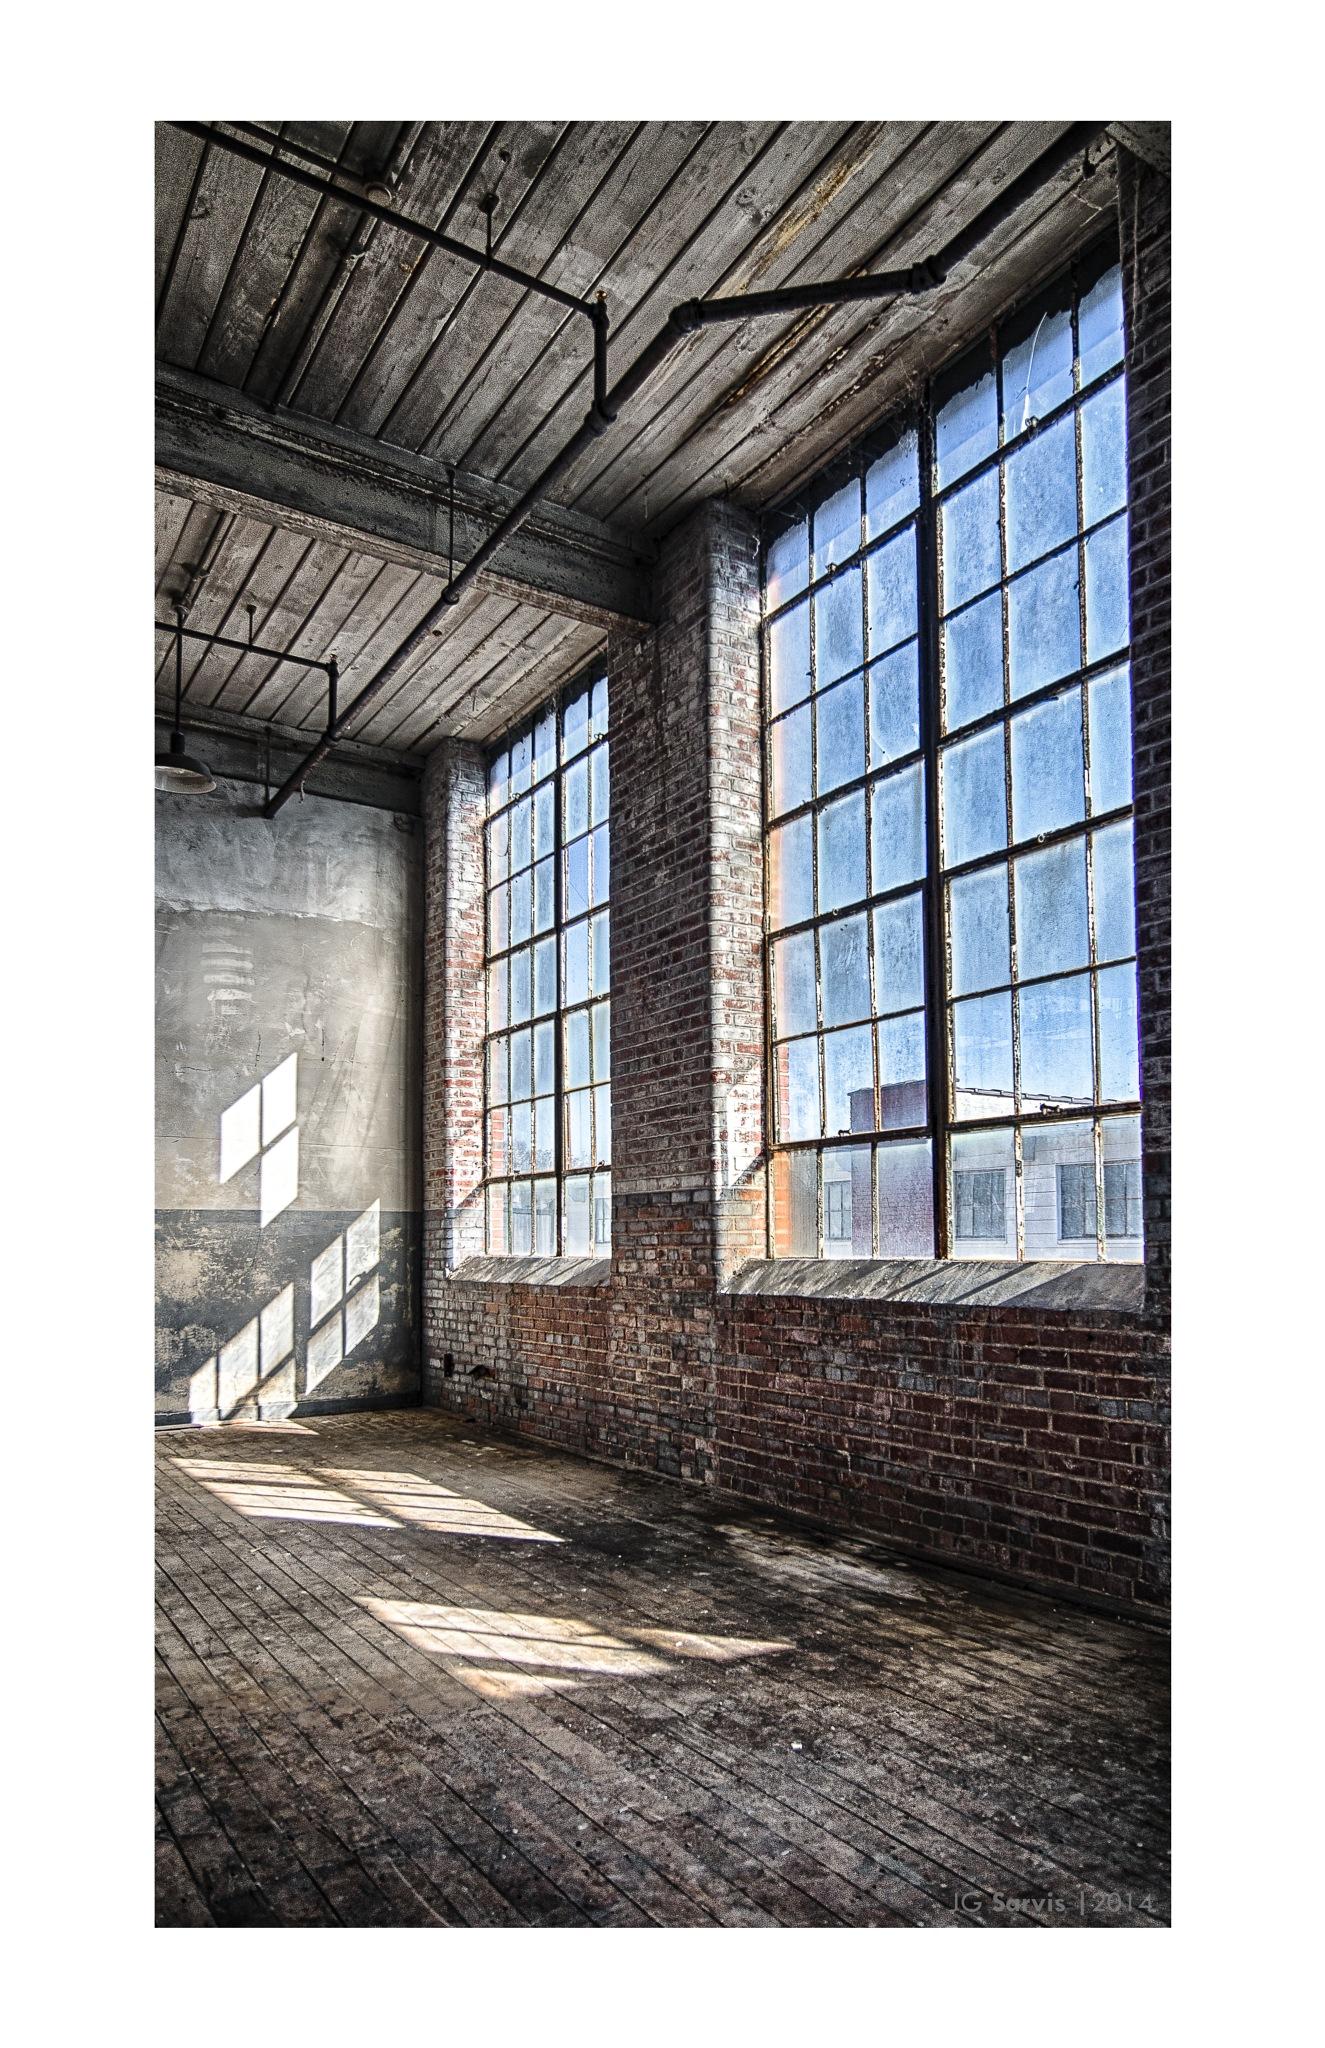 Taylors Mill 1 by jgsarvis